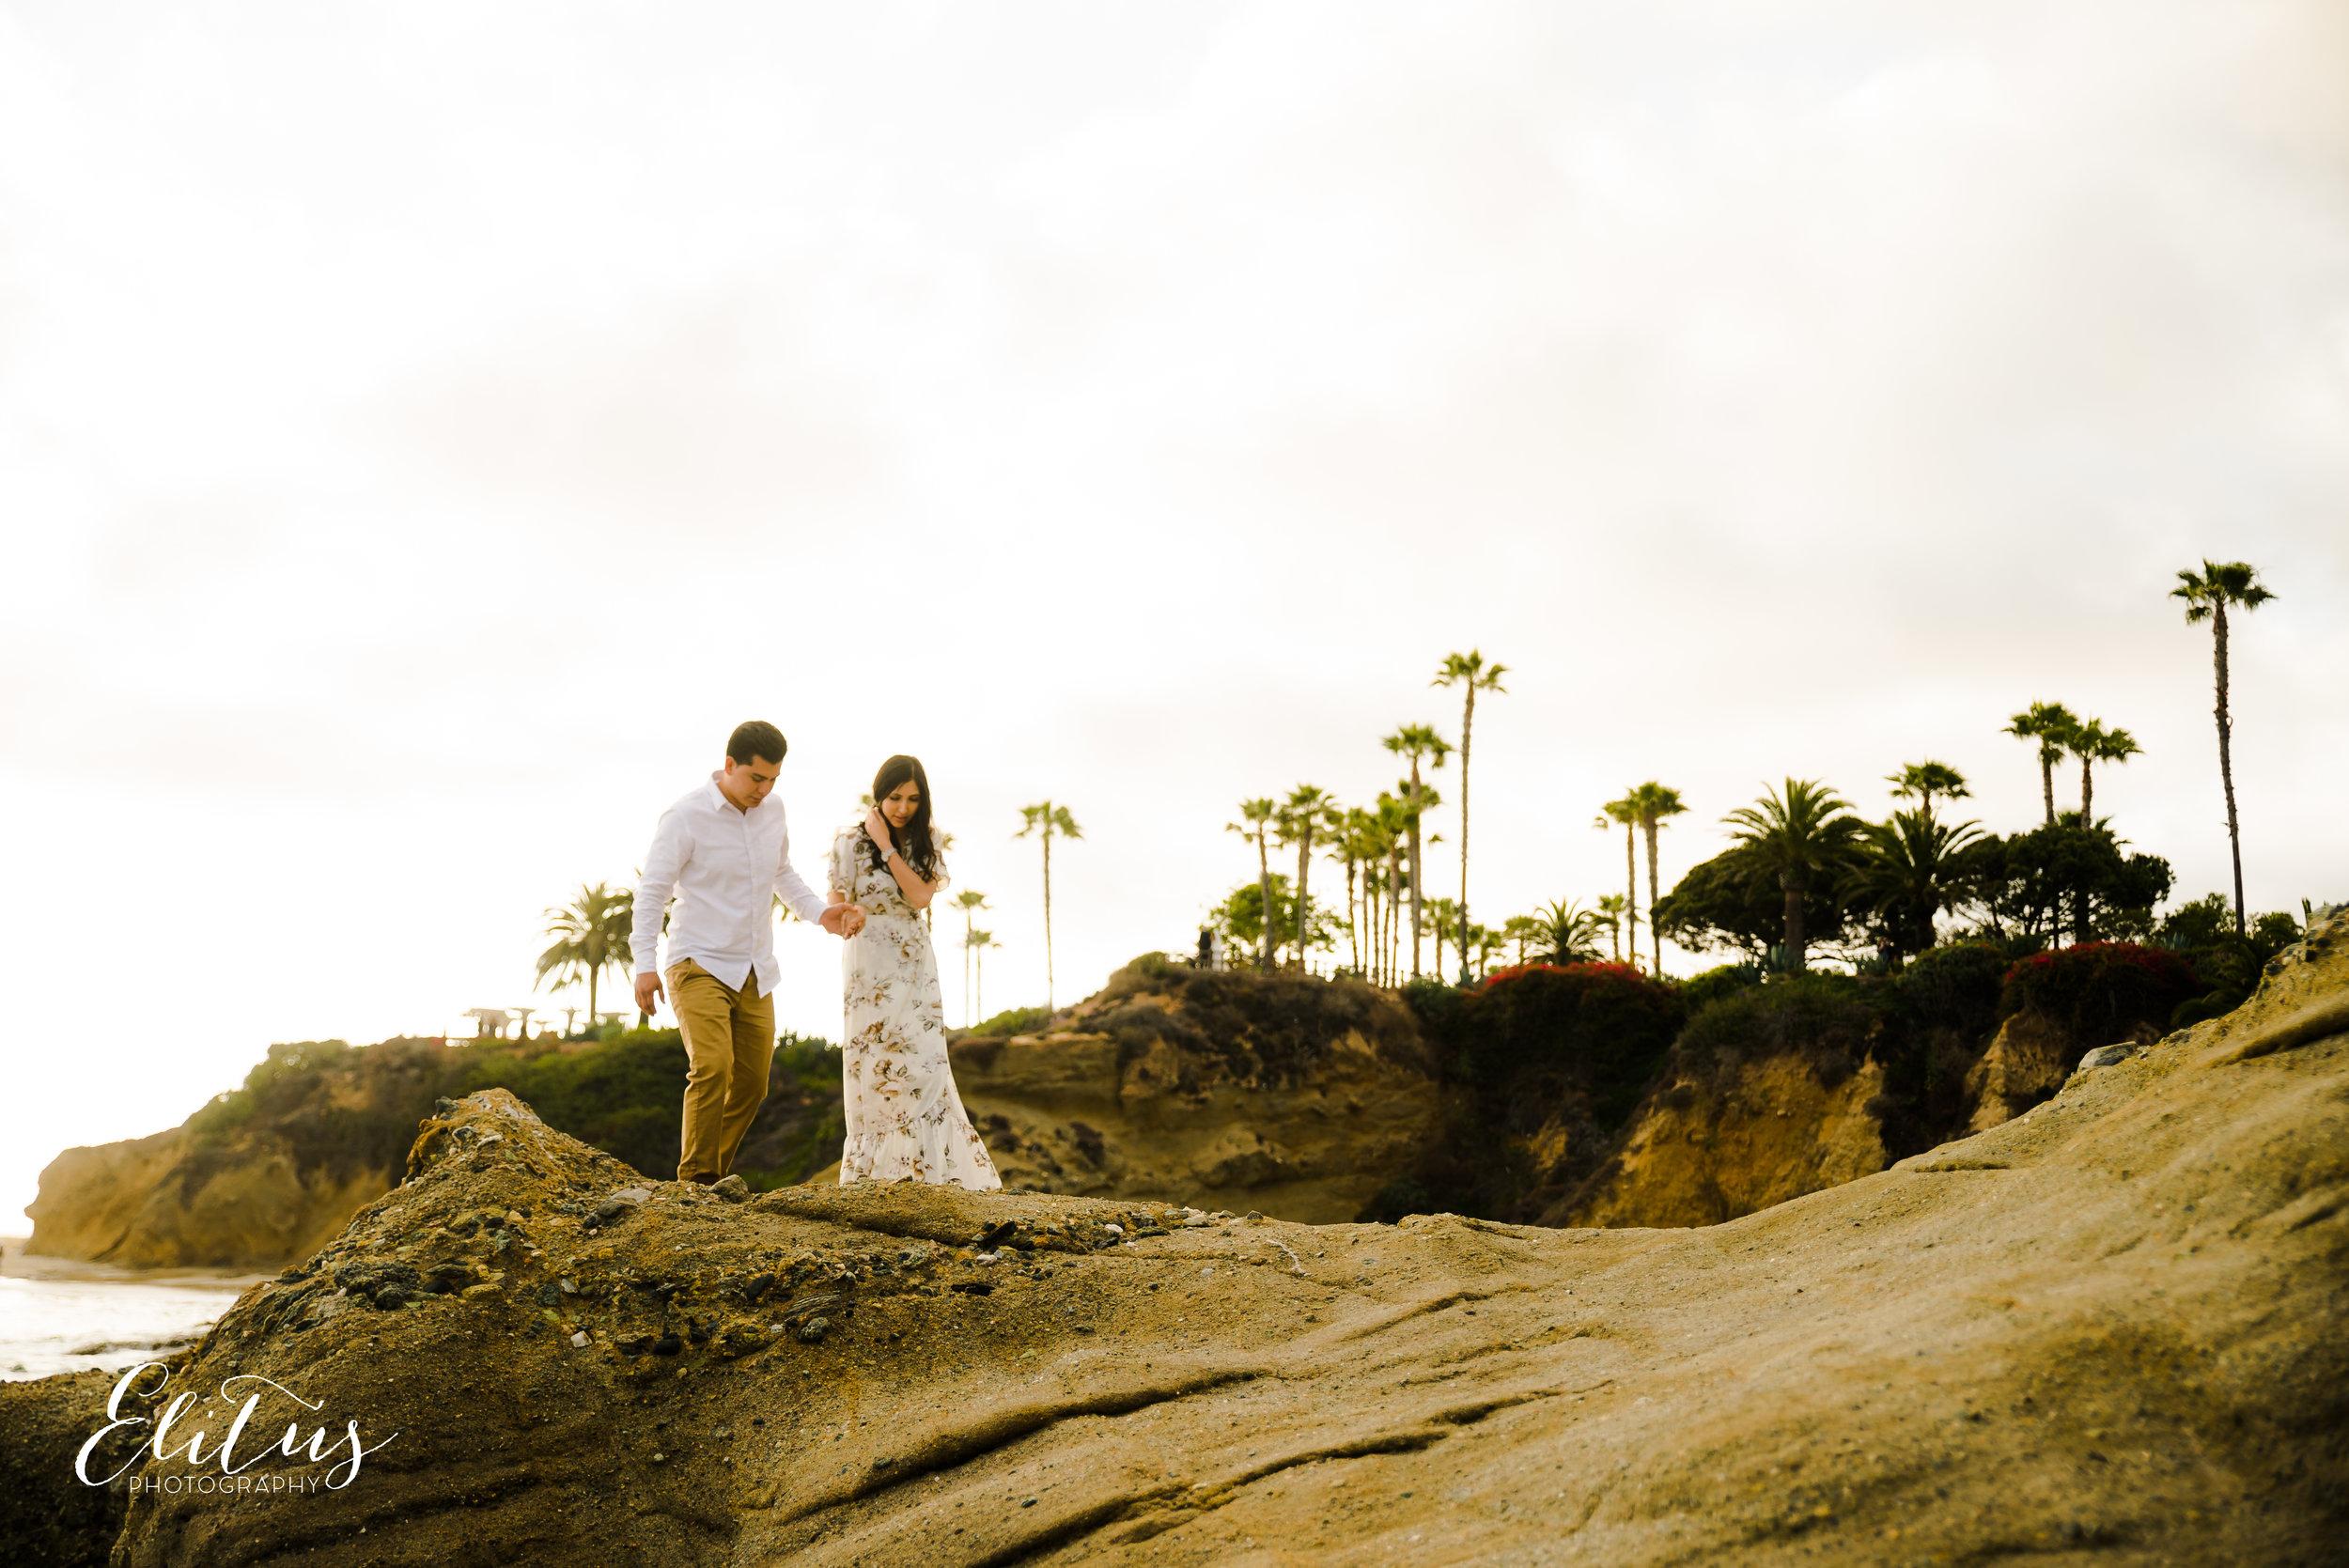 elitus-photograpy-laguna-beach-marisol-benito-engagement (84 of 115).jpg